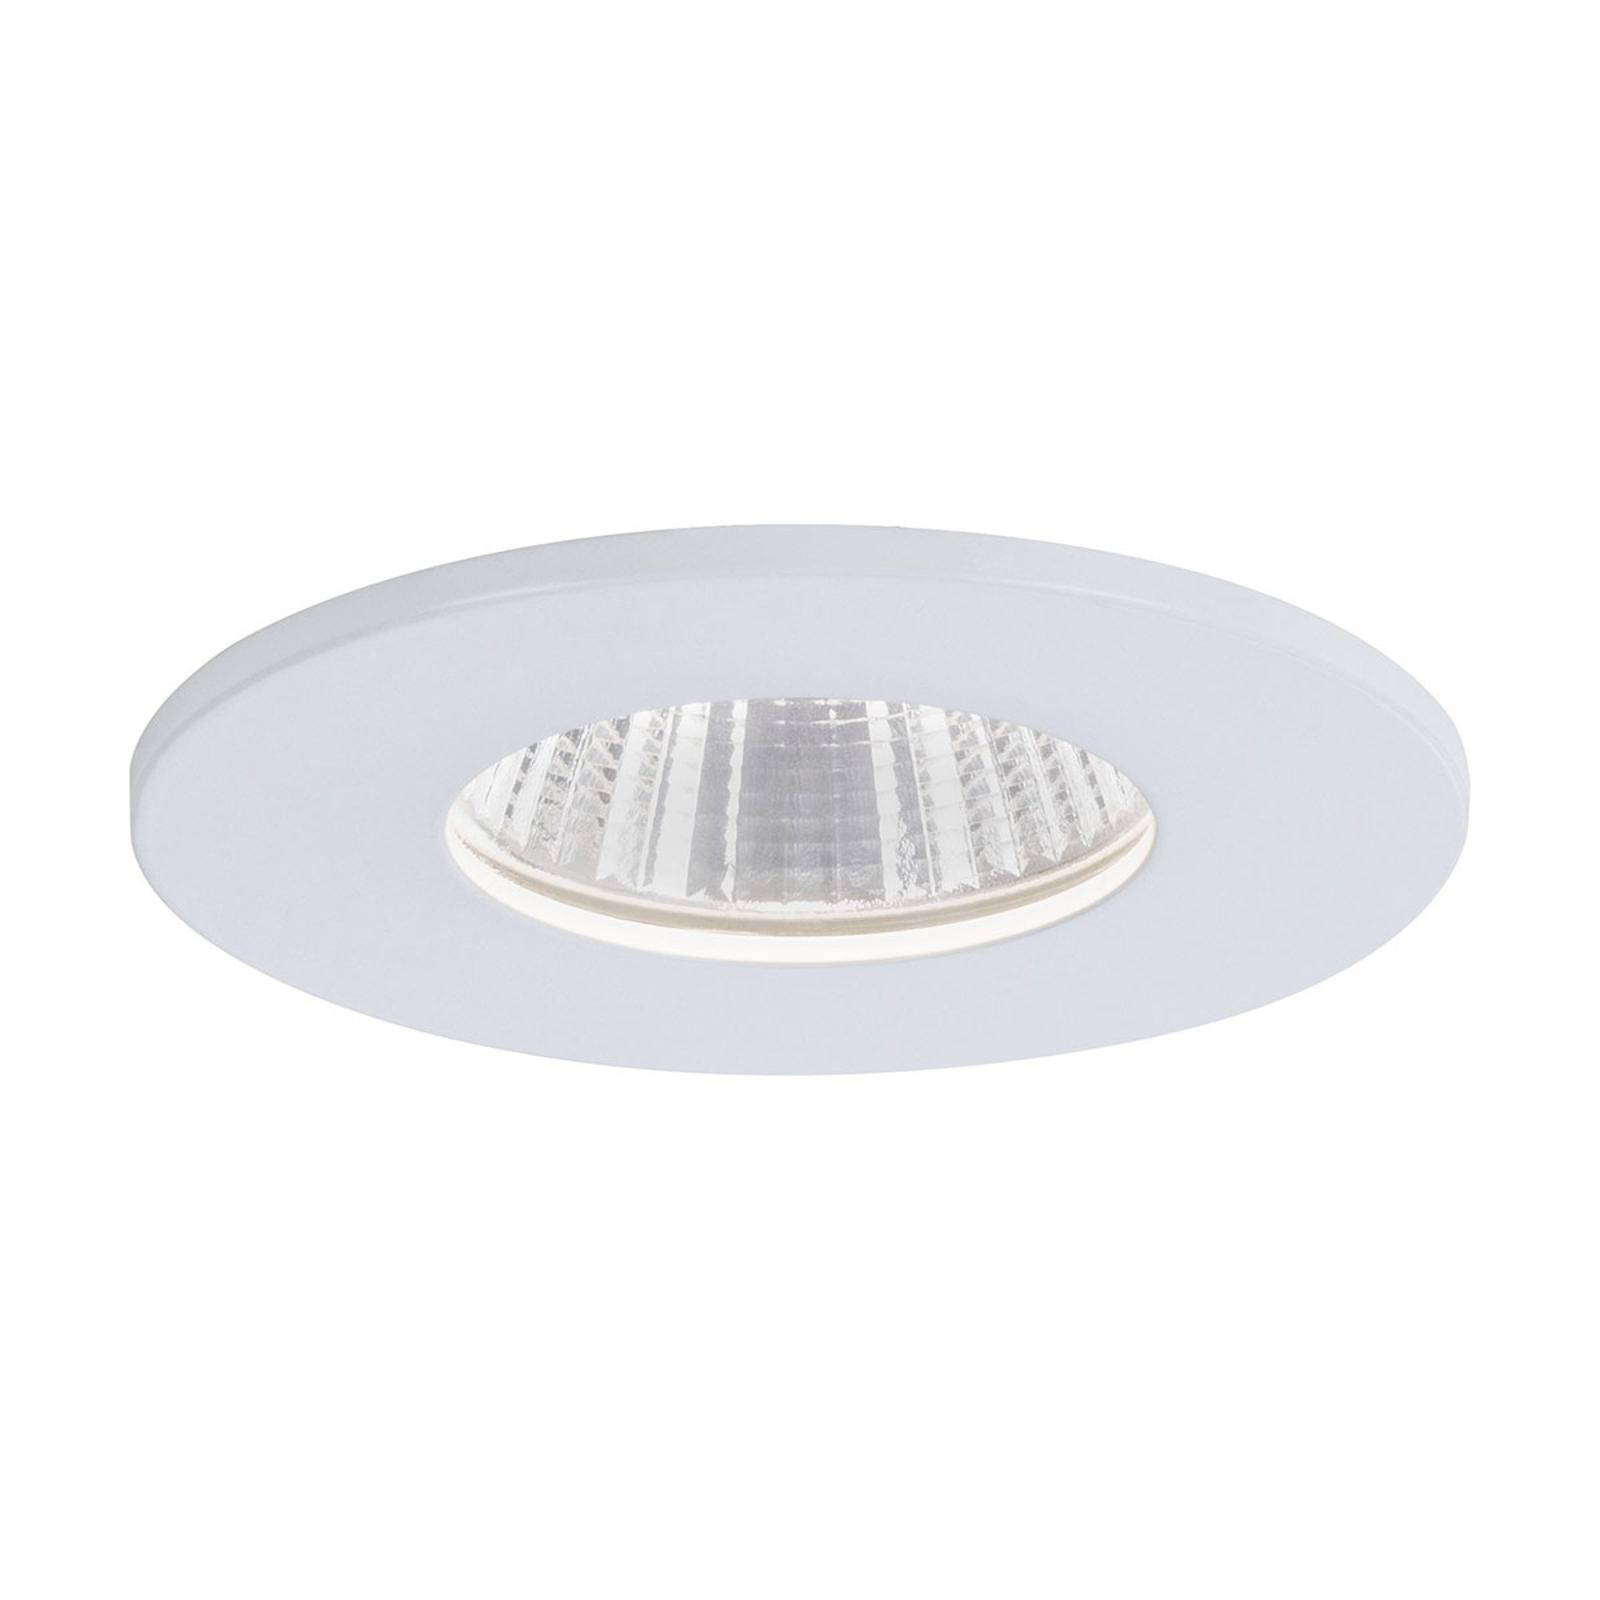 Paulmann LED-downlight Calla hvit 1x7W IP65